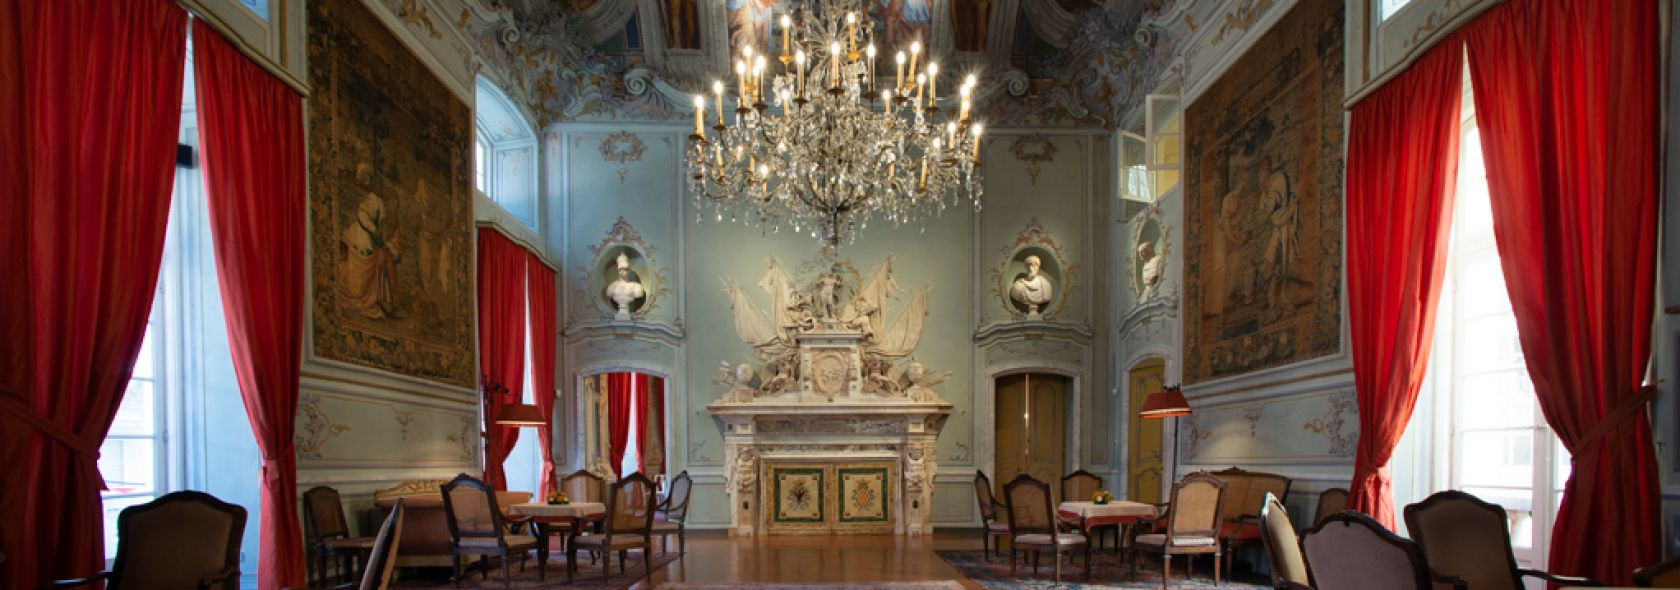 Palazzo Spinola Doria